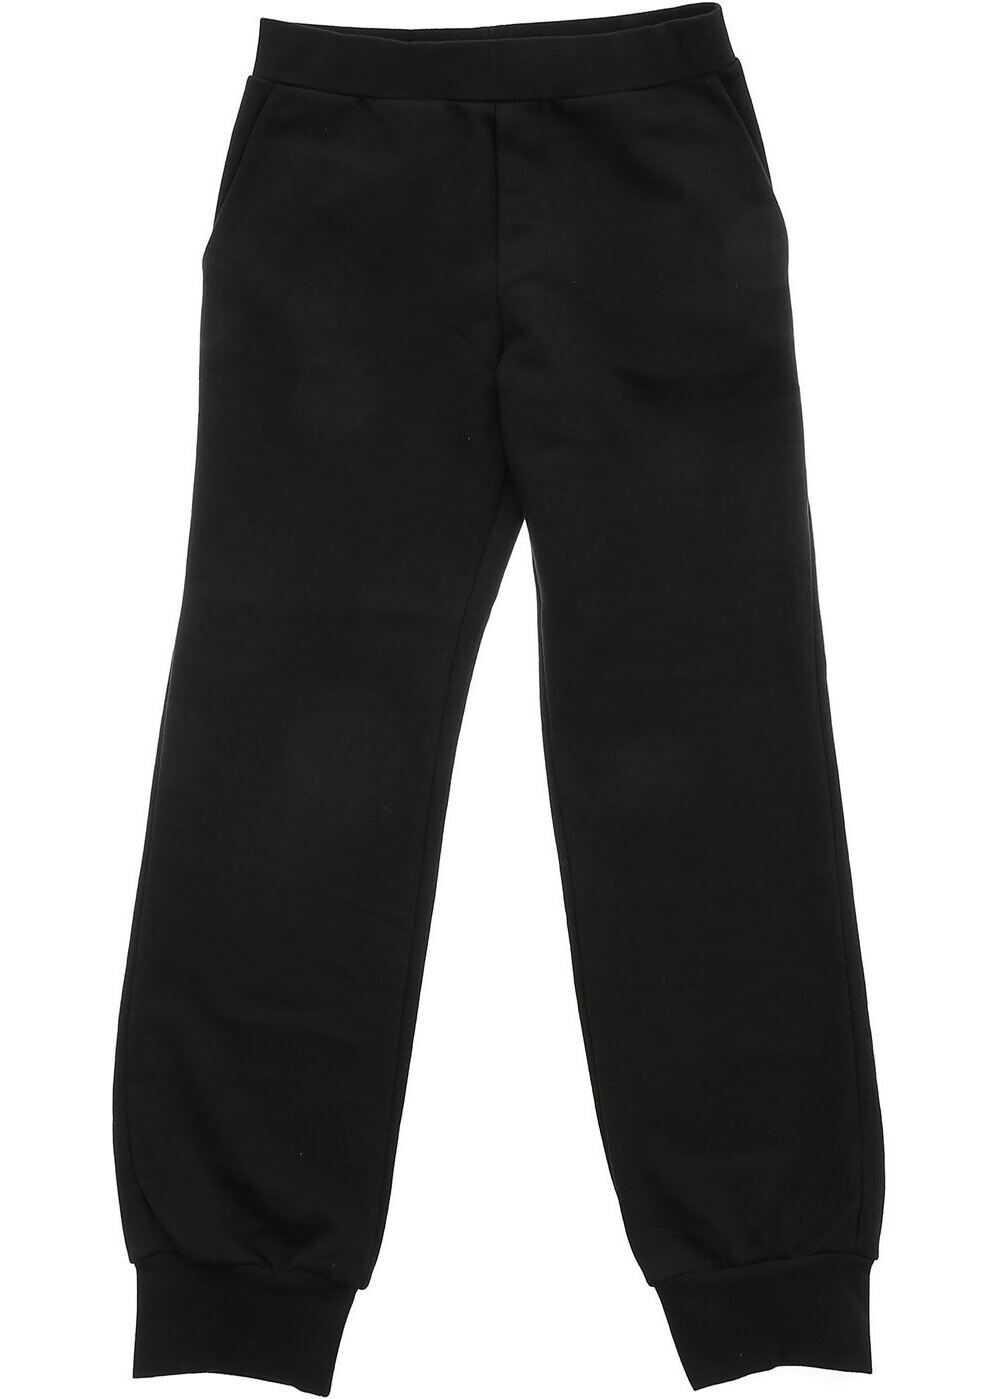 Fendi Kids Black Sweat Pant With Fendi Stamp Logo Black